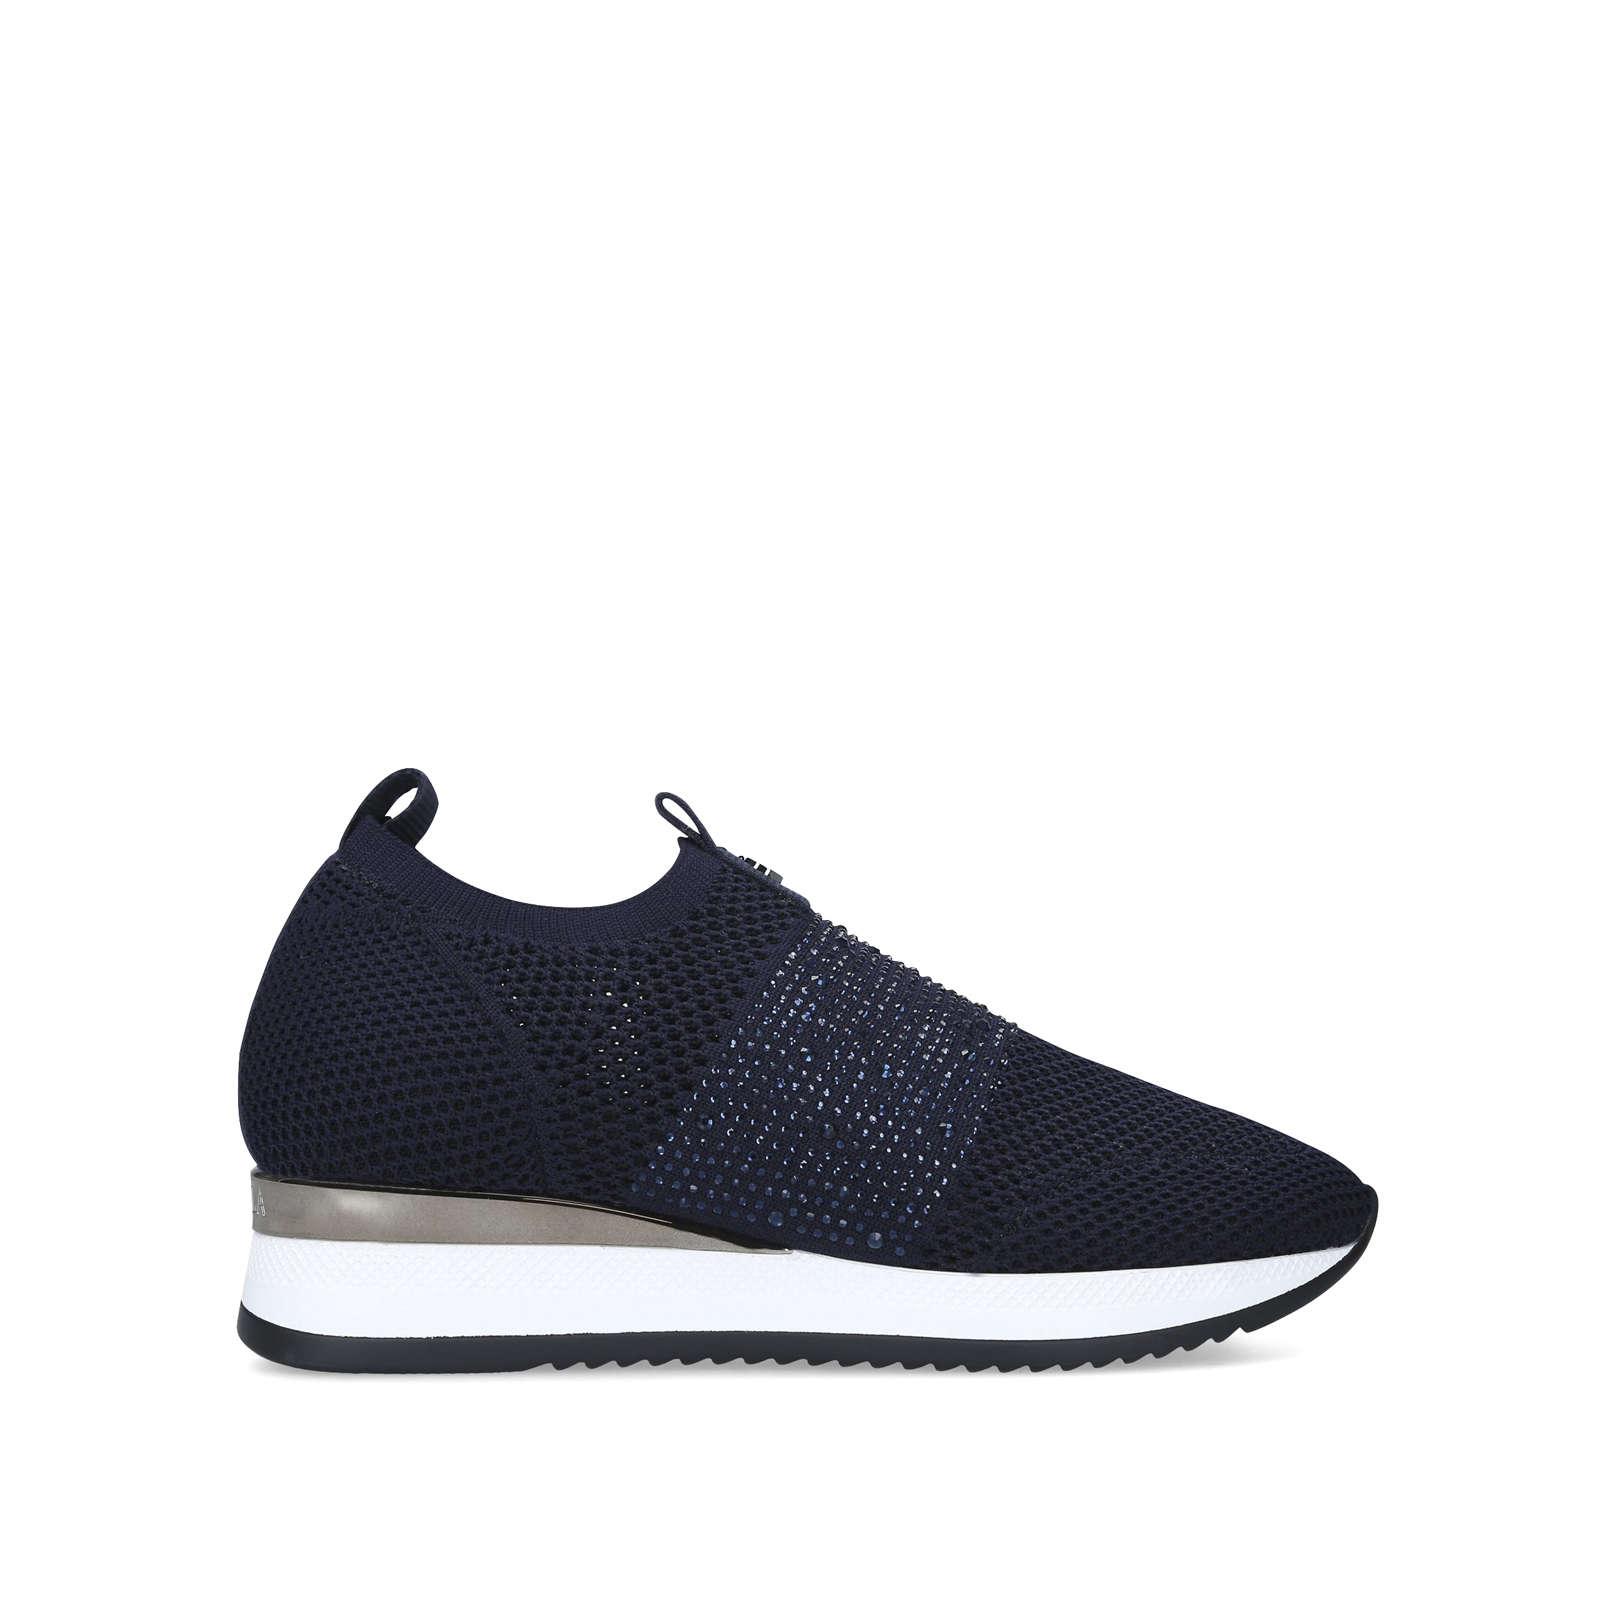 JANEIRO - CARVELA Sneakers